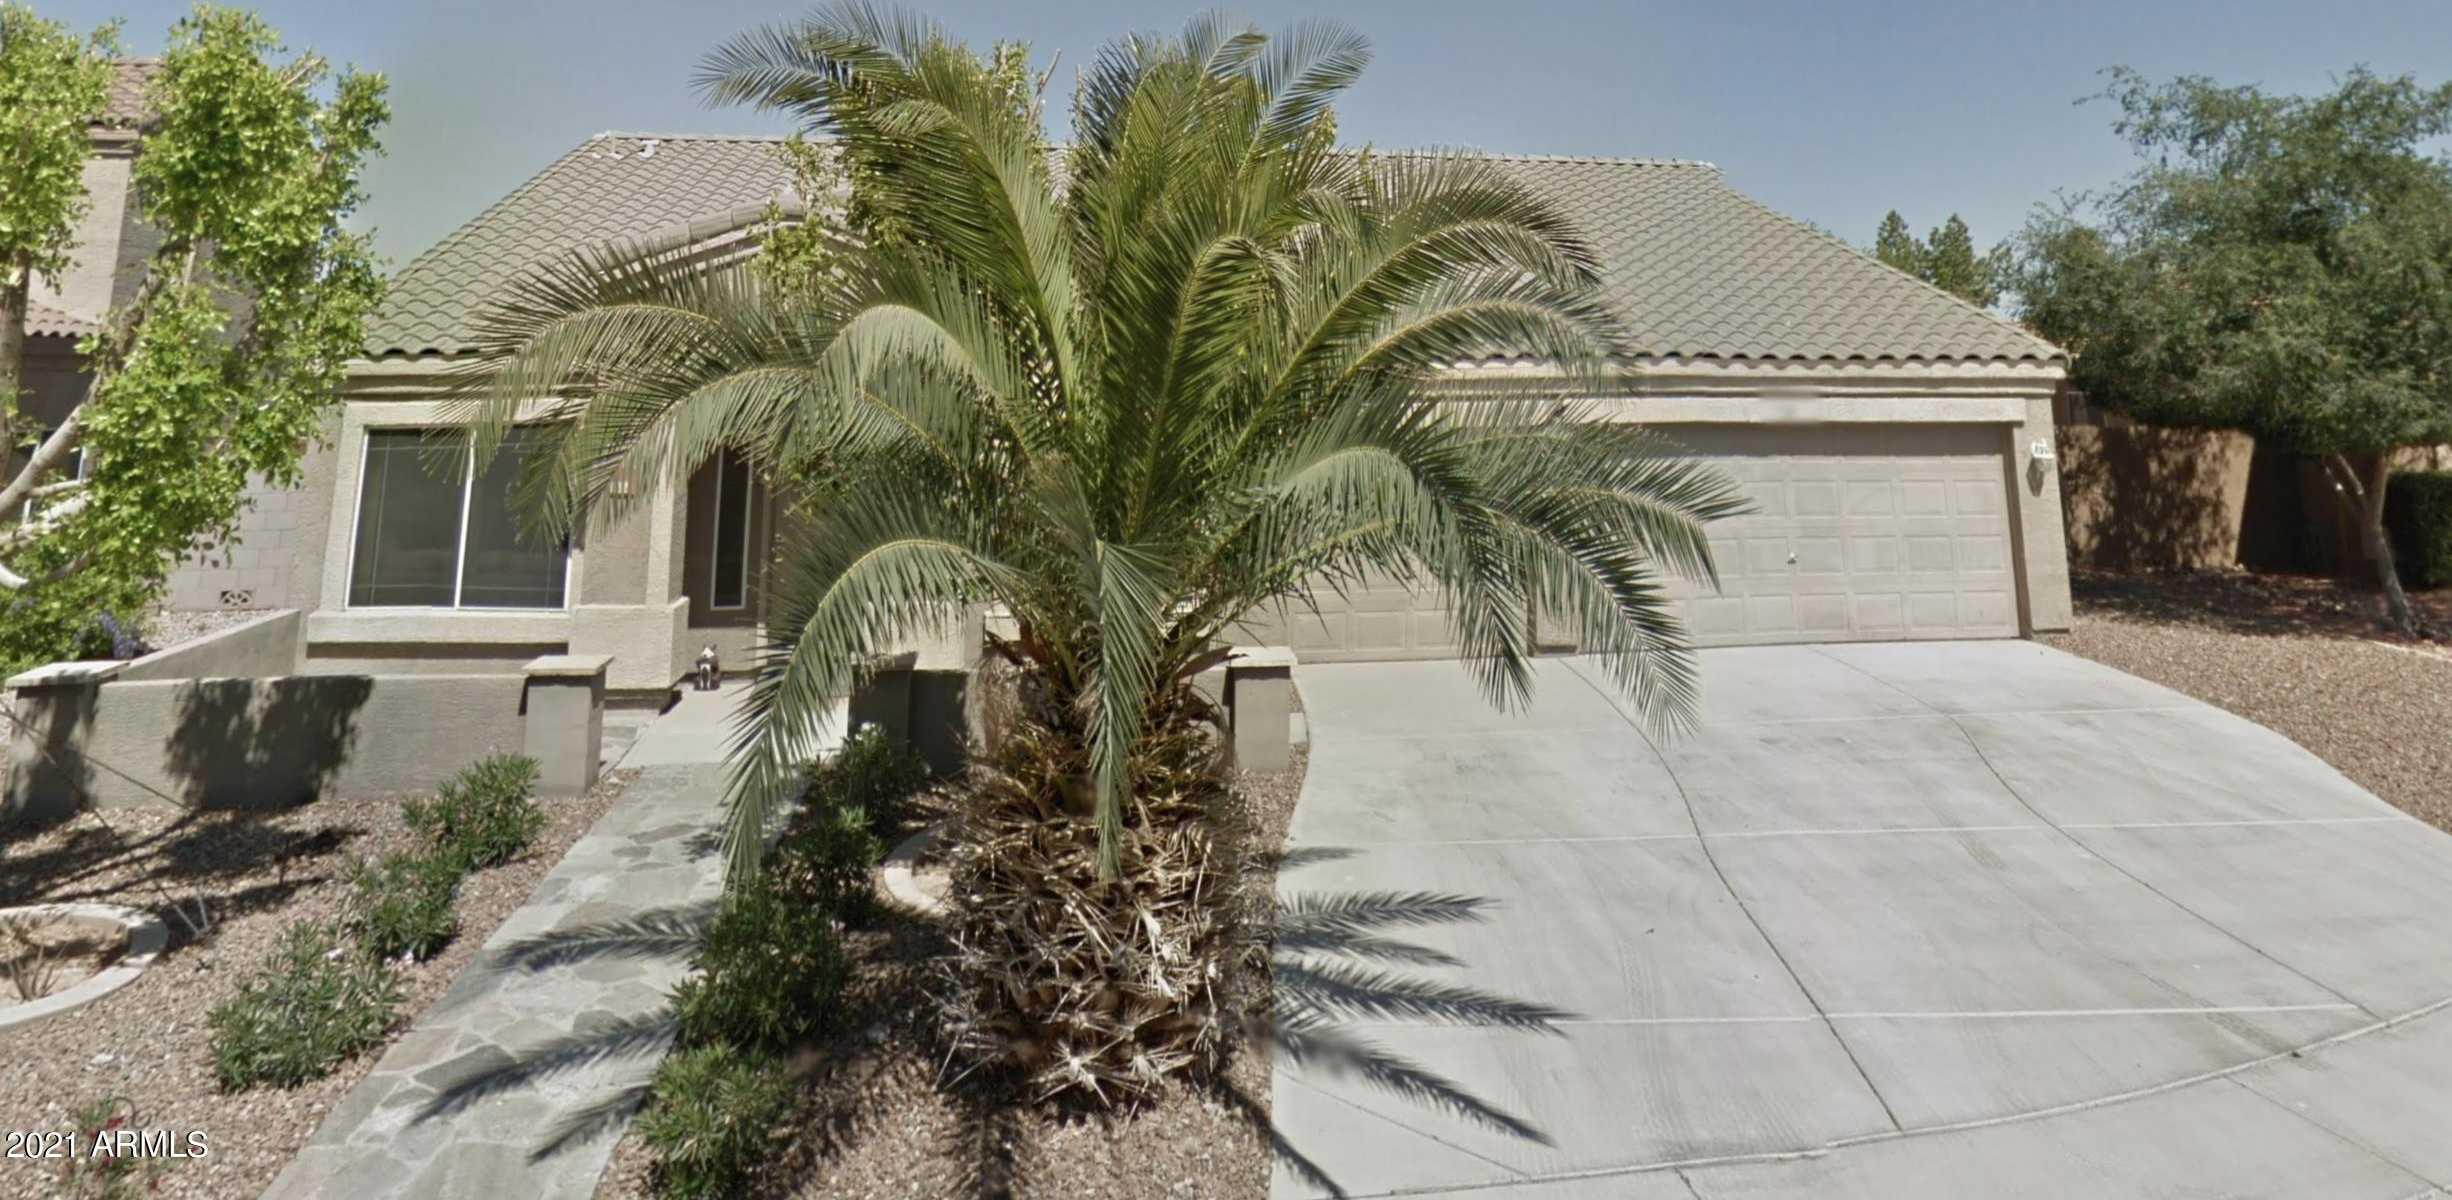 $465,000 - 4Br/2Ba - Home for Sale in Parkwood Ranch Parcel 8, Mesa